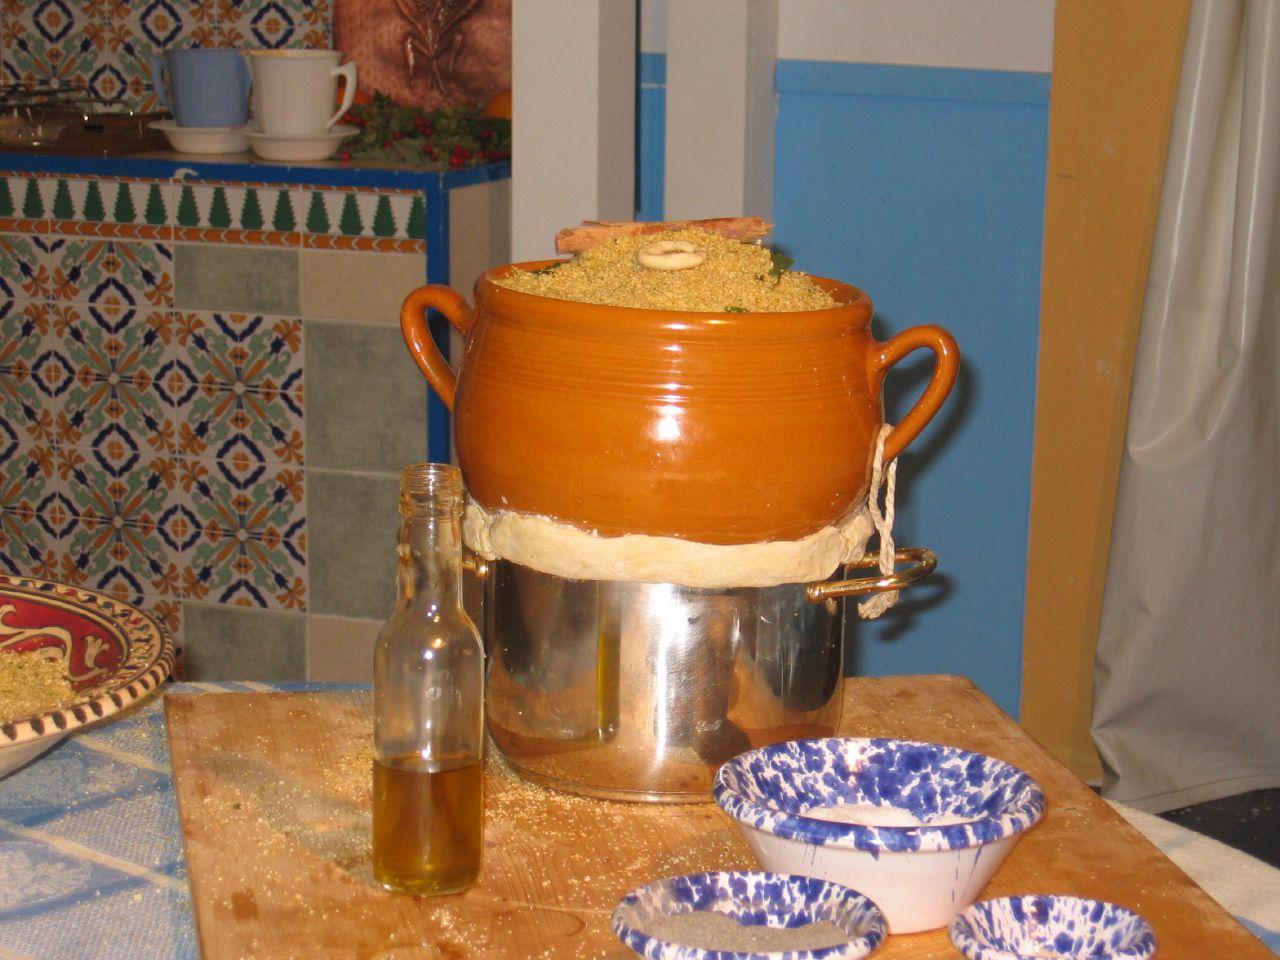 Cuscus, kuskus, cous cous, cuscusu, cuscusu trapanese, historia kuskusu, przygotowanie kuskusu, jak gotować kuskus, sycylia, kuskus z trapani, Trapani, cous cous fest, san vito lo capo, cuscus trapanese, italia, włochy, festyn kuskus, sagra kuskus, kuskus arabski, skąd pochodzi kuskus, skąd pochodzi nazwa kuskus, cuscusera, cuscussiera